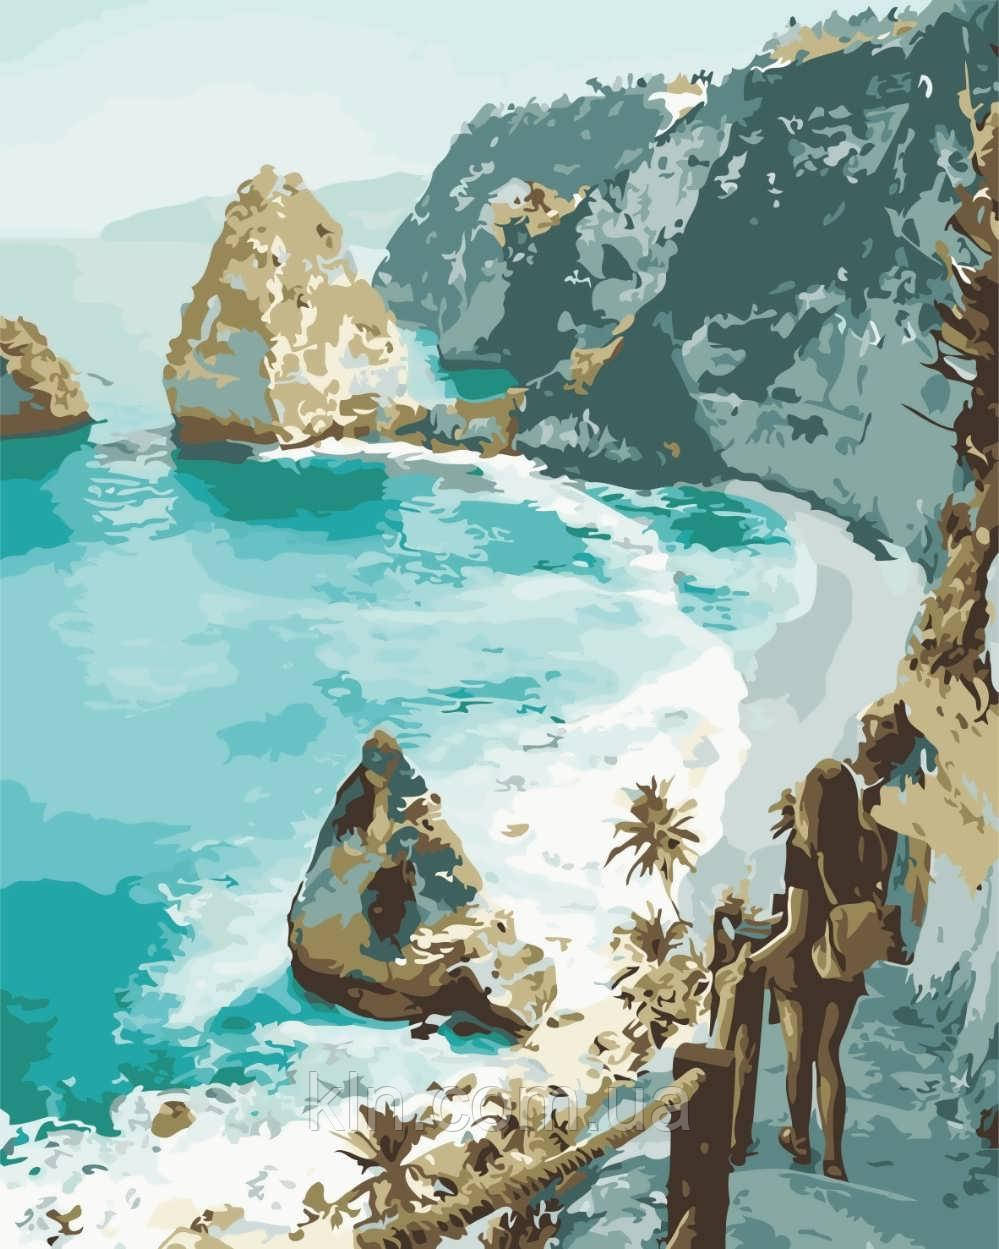 Картина по номерам ArtStory Мечты об океане 40 х 50 см (арт. AS0645)